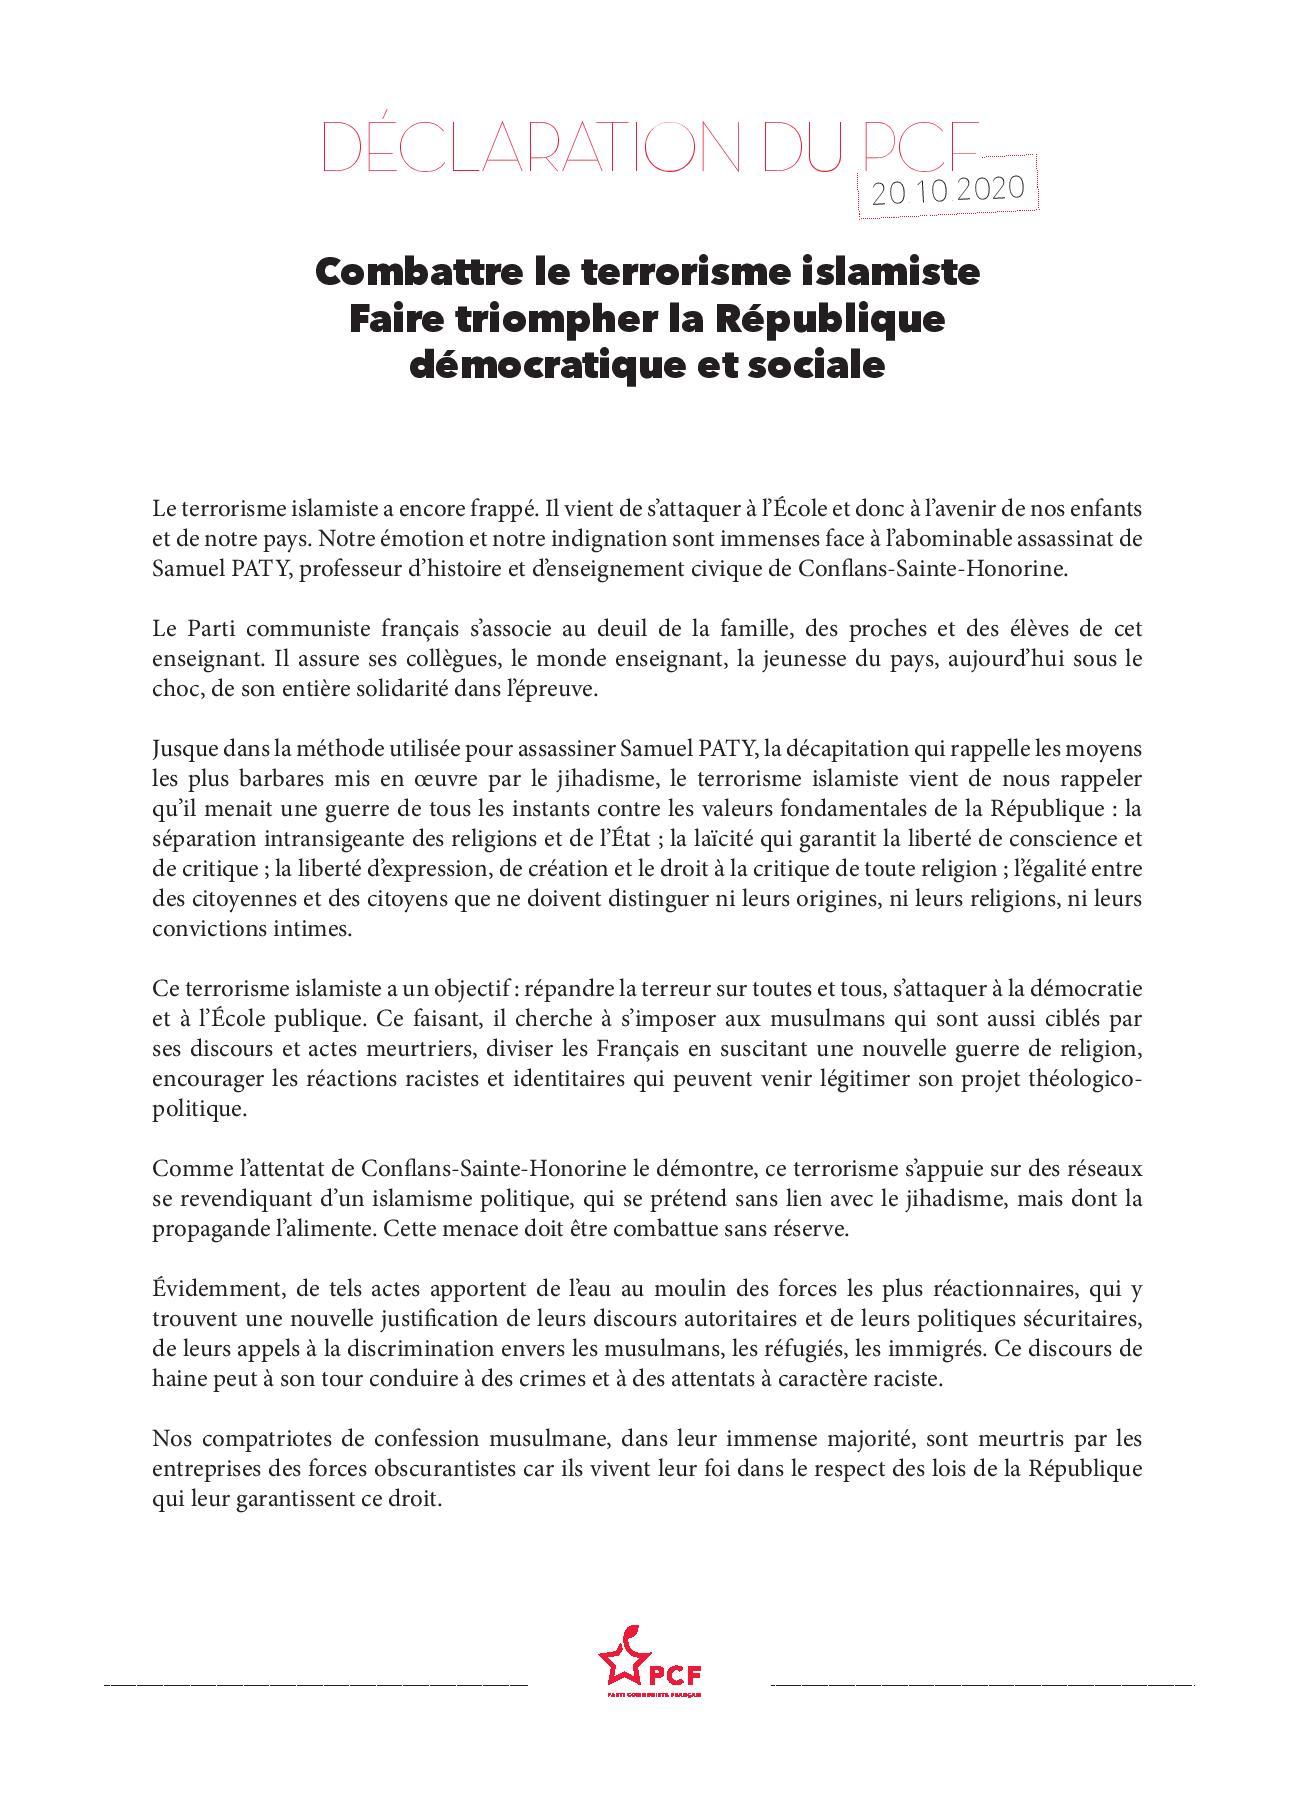 declaration-page-001.jpg